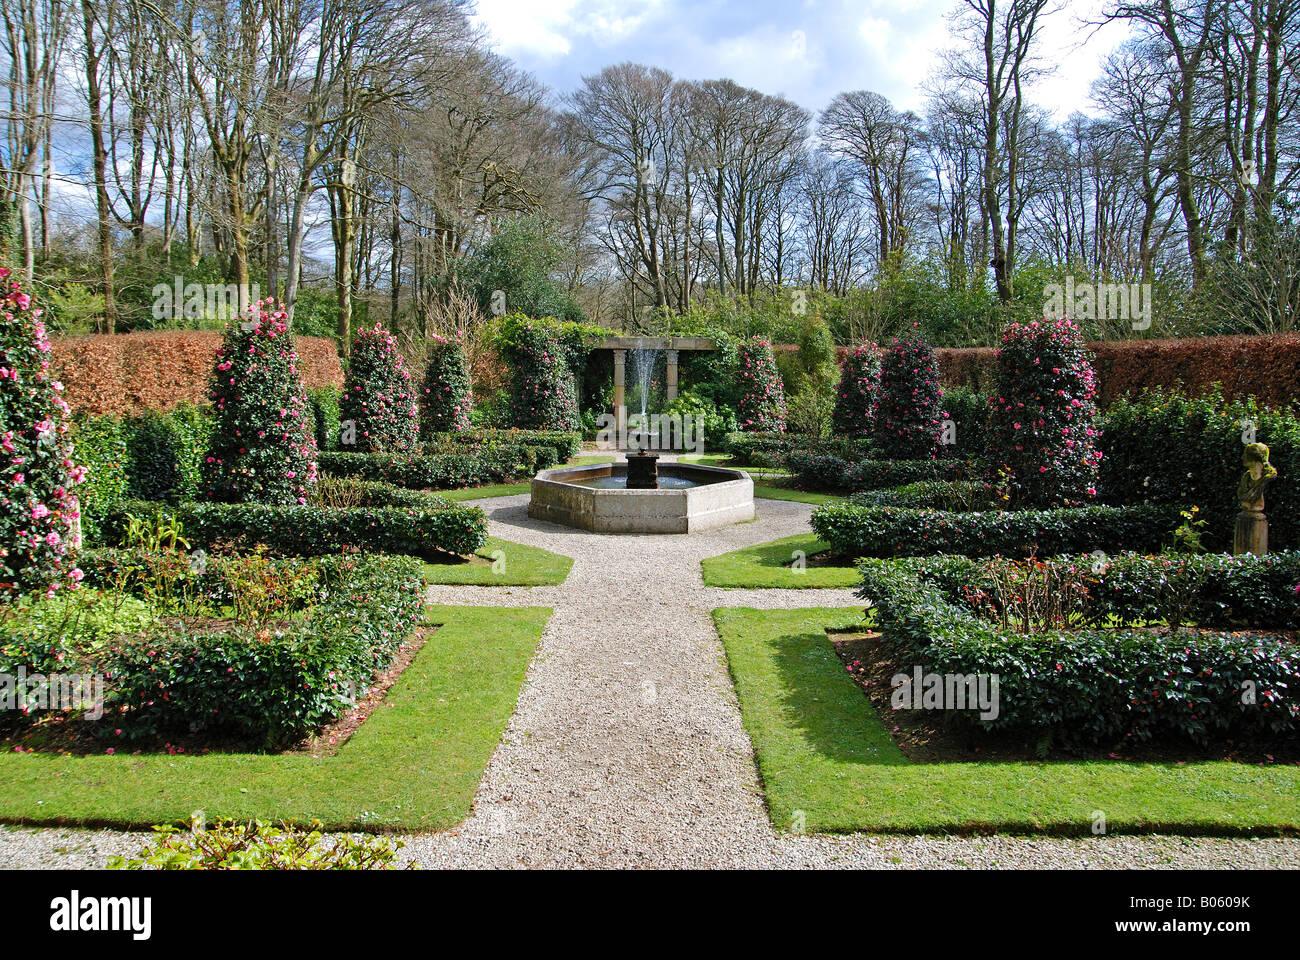 the italian sunken garden at trevarno gardens near helston,cornwall,england - Stock Image